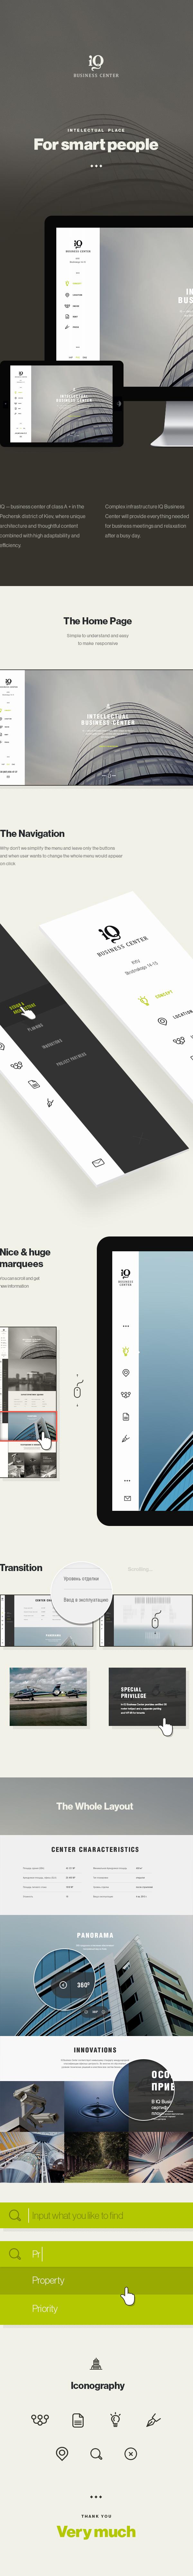 Web Responsive business visual design center Layout mobile ukraine usa interaction Website site ux